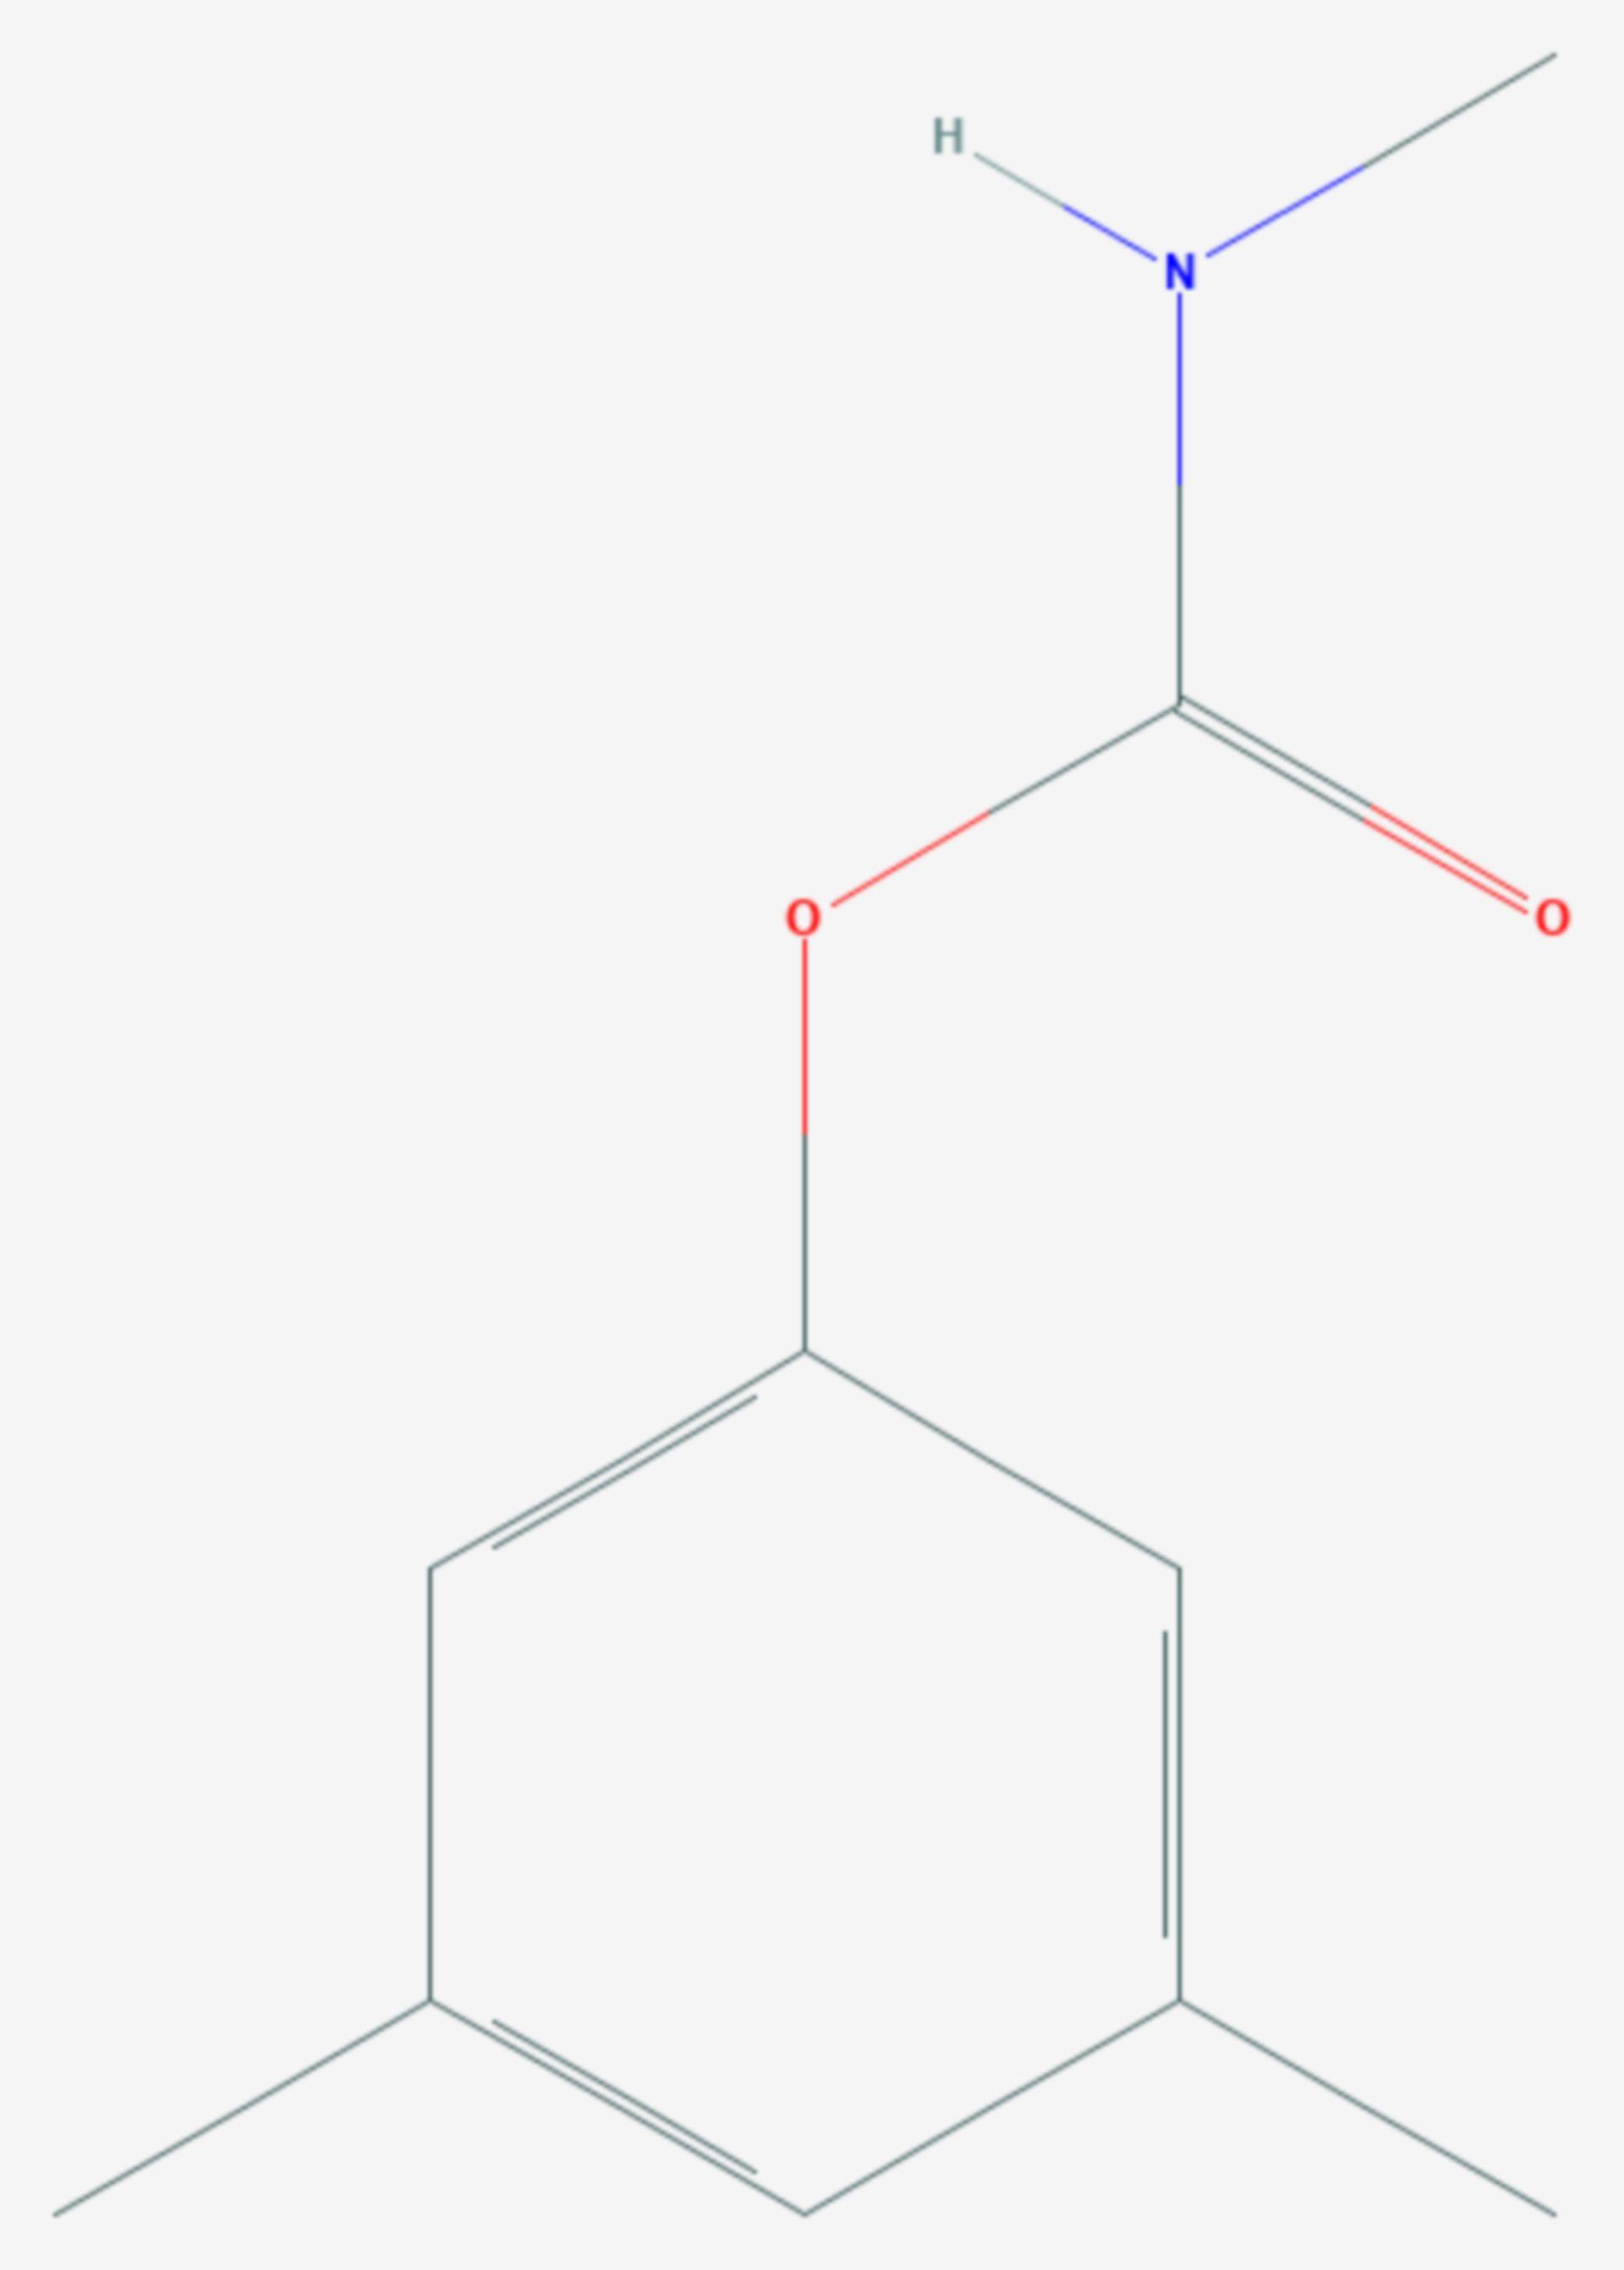 3,5-Xylylmethylcarbamat (Strukturformel)